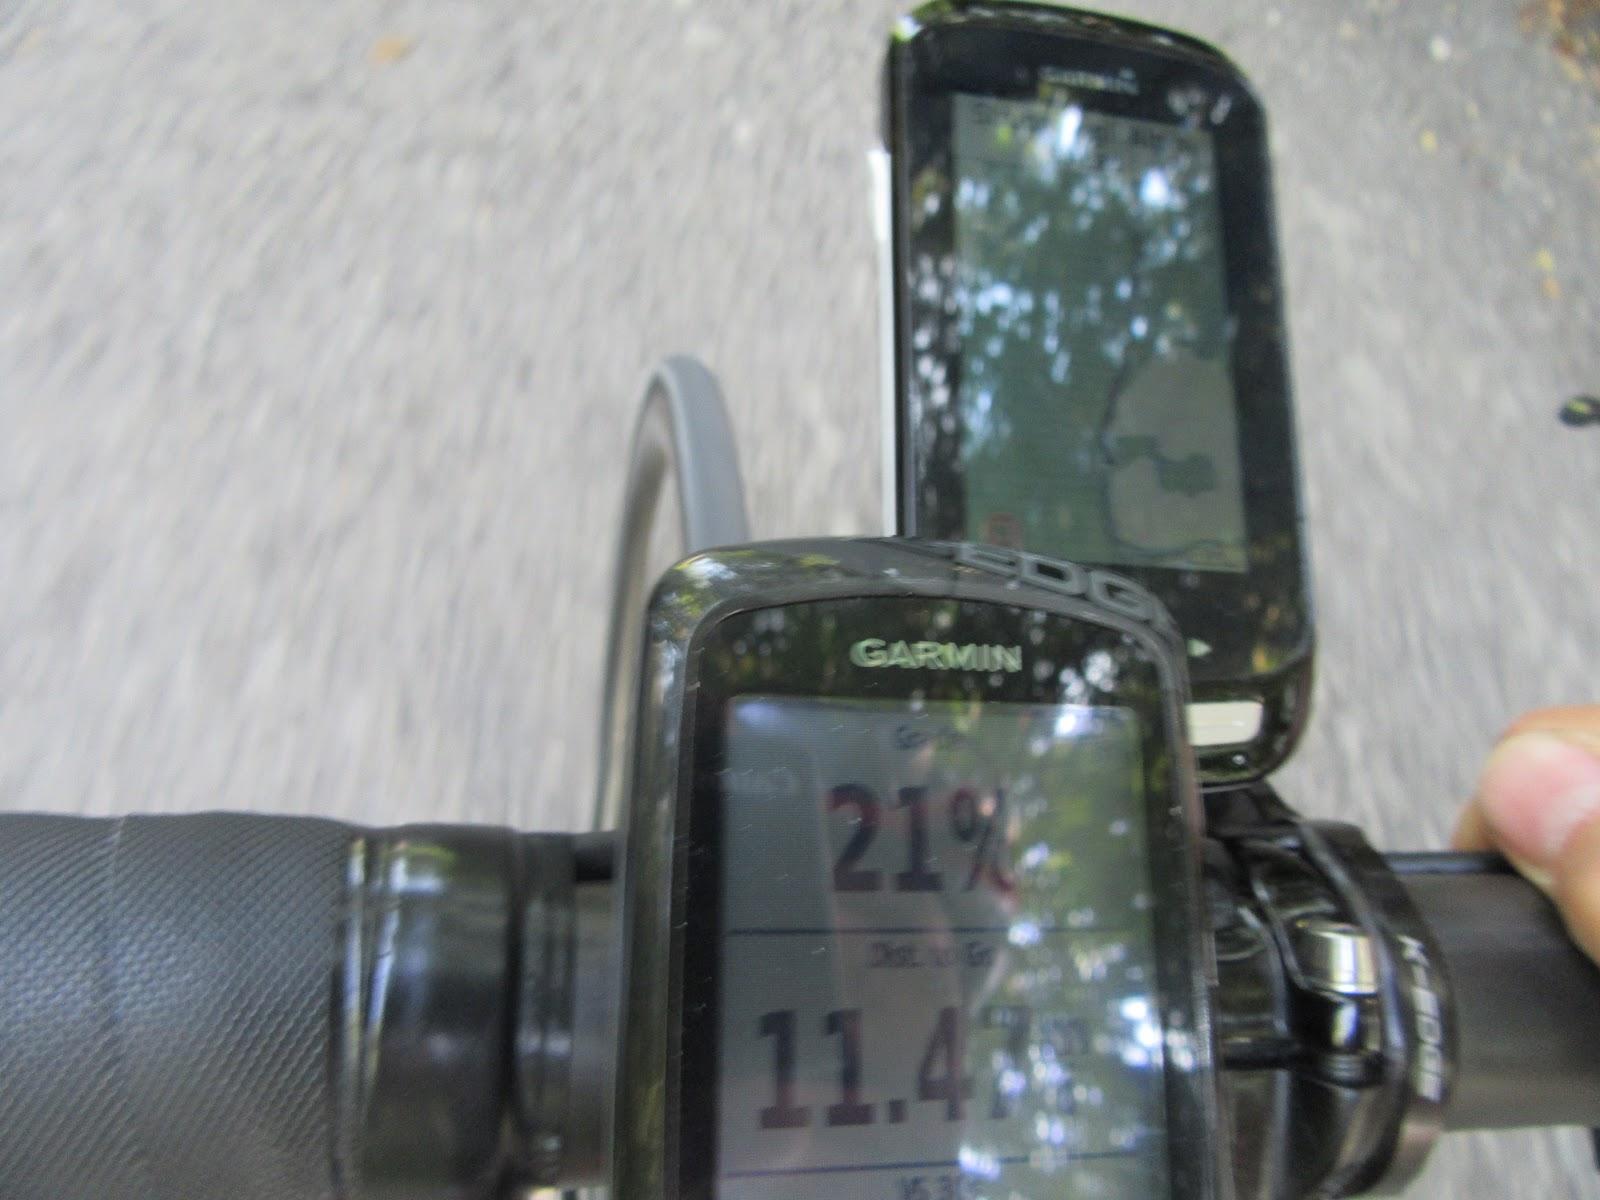 Biking Monte Grappa from Possagno - garmin showing 21% grade